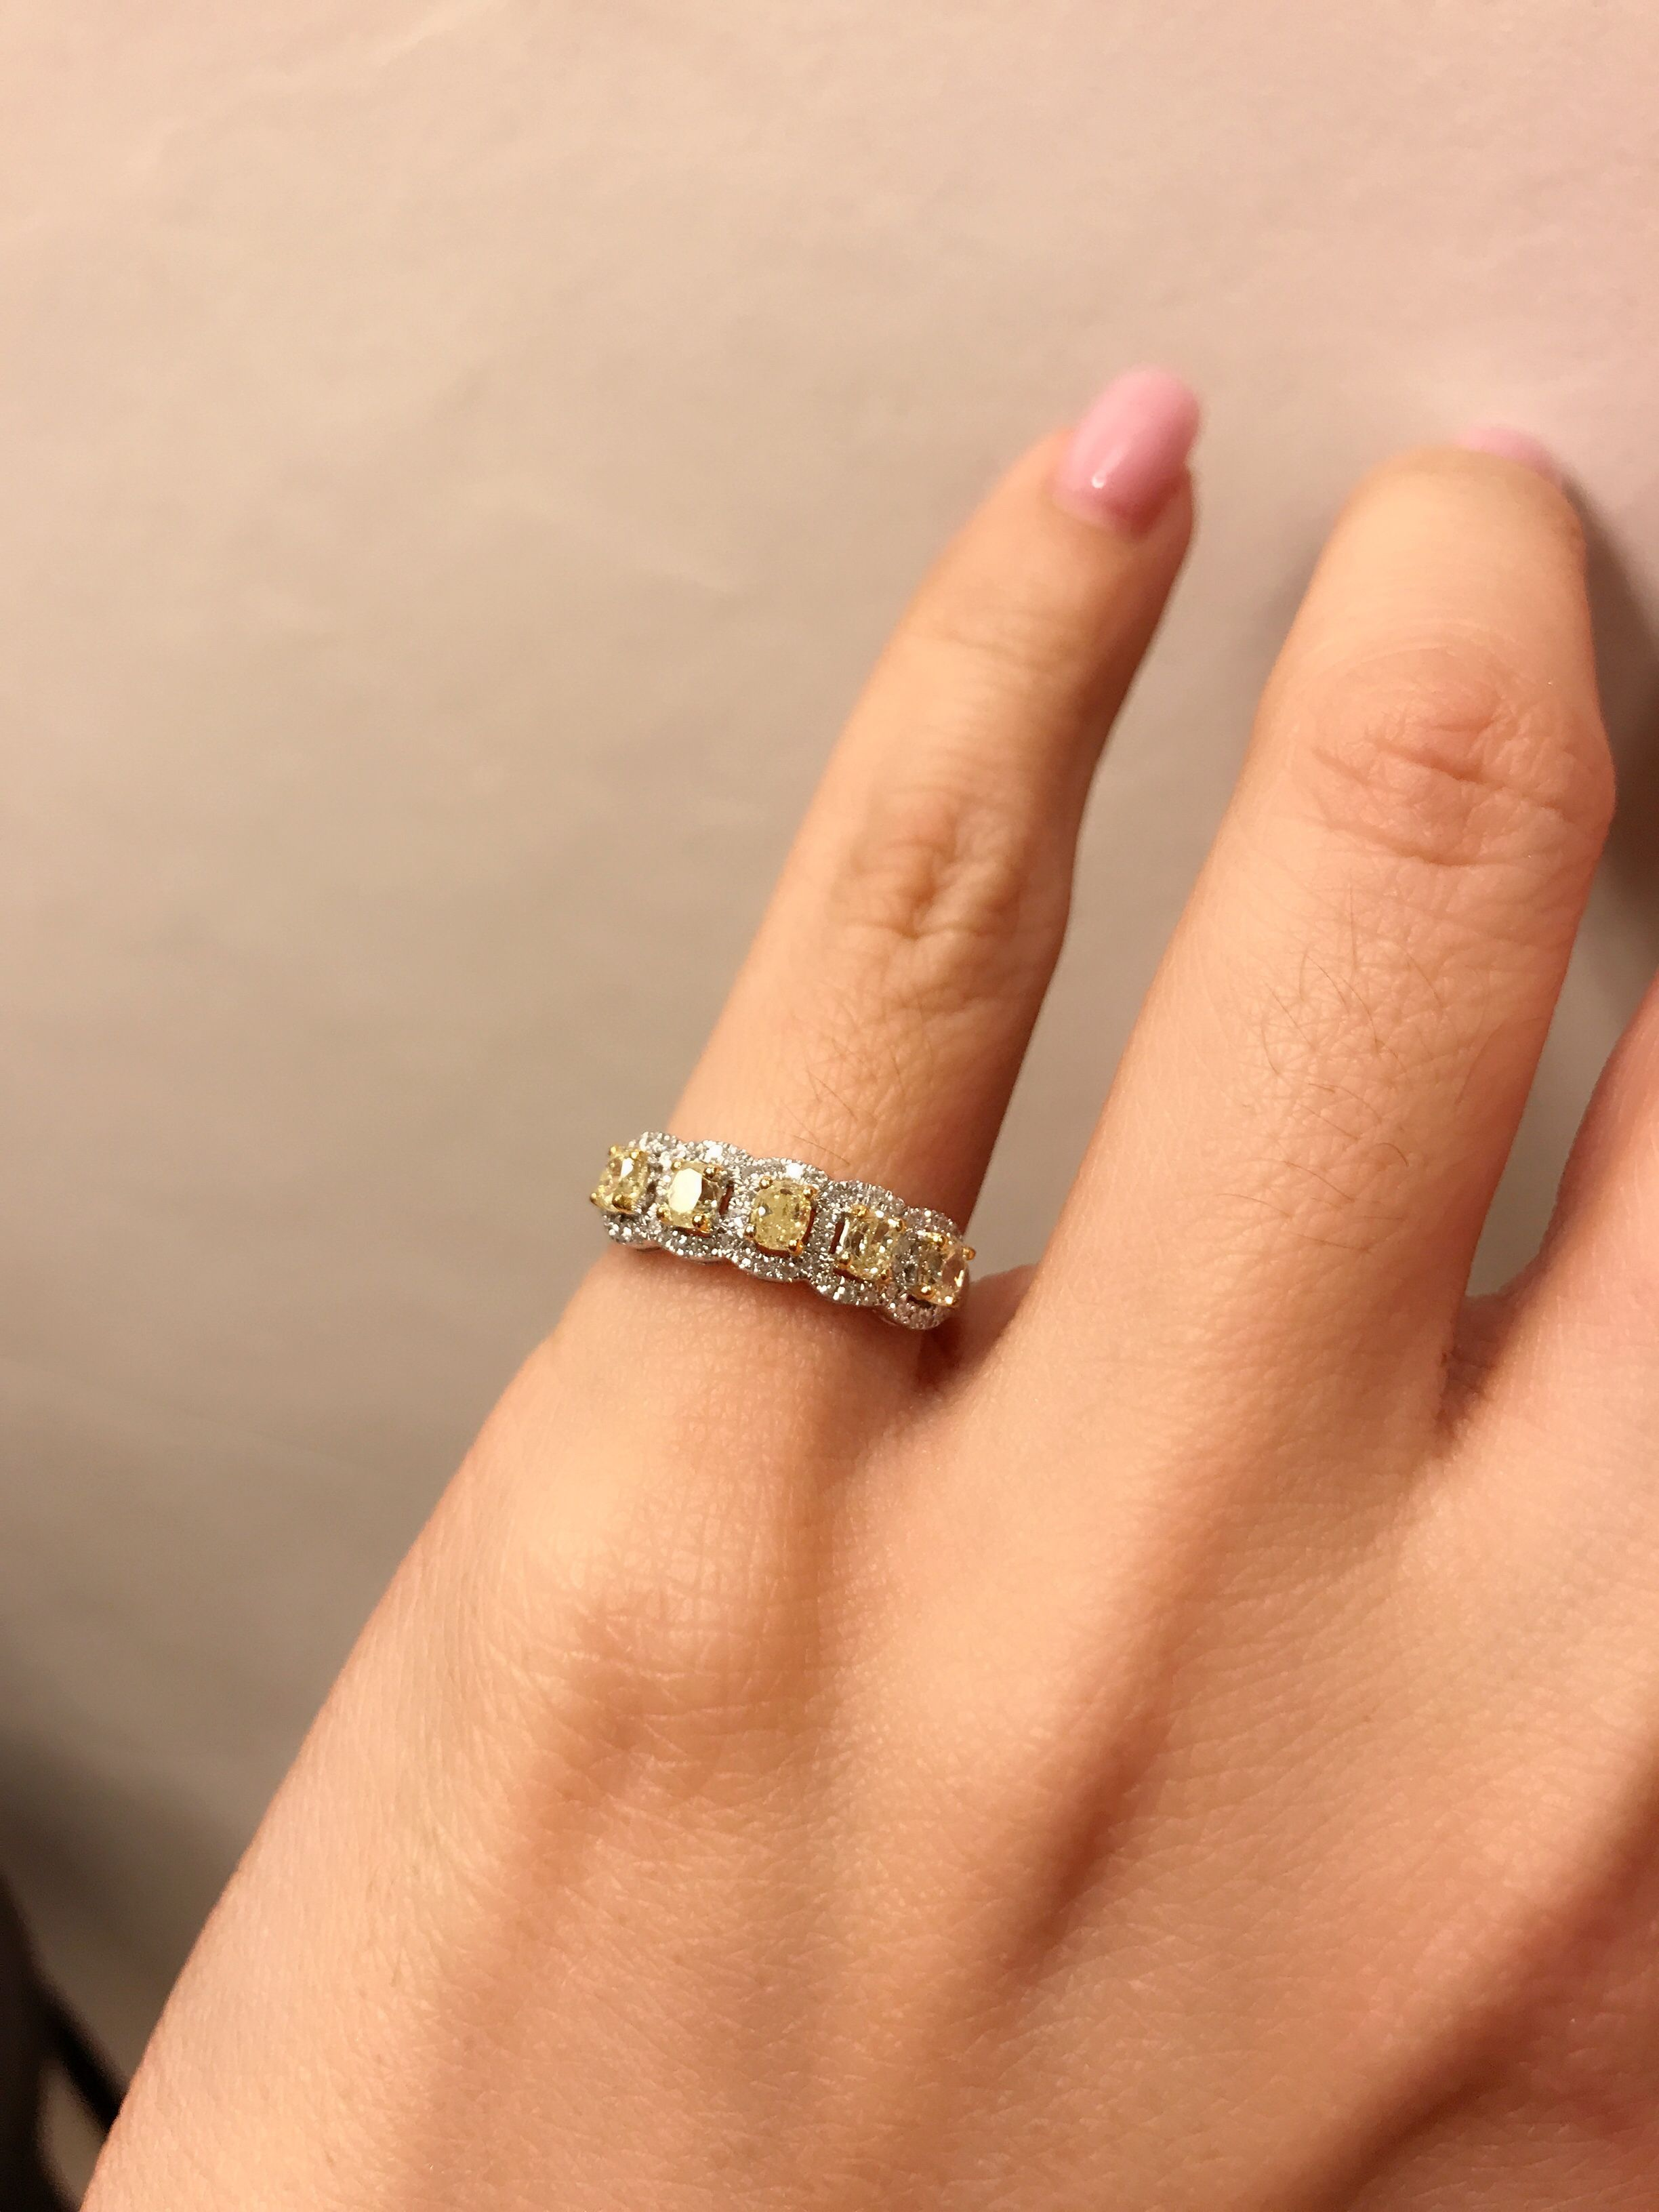 Fancy Yellow Diamond Baby Finger Ring Wedding Ring Finger